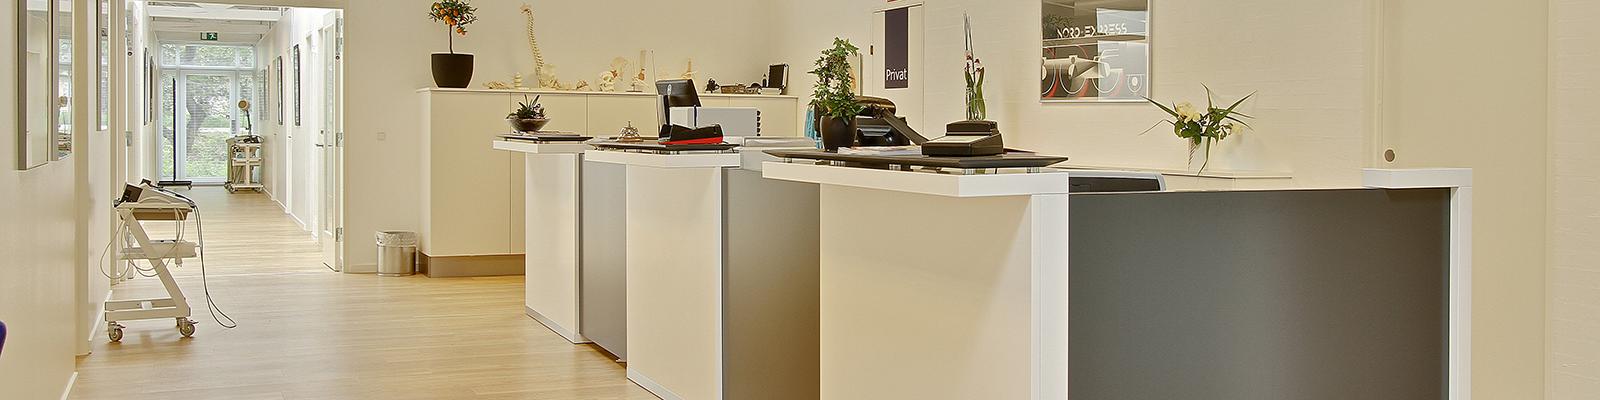 reception-fysiodanmark-silkeborg